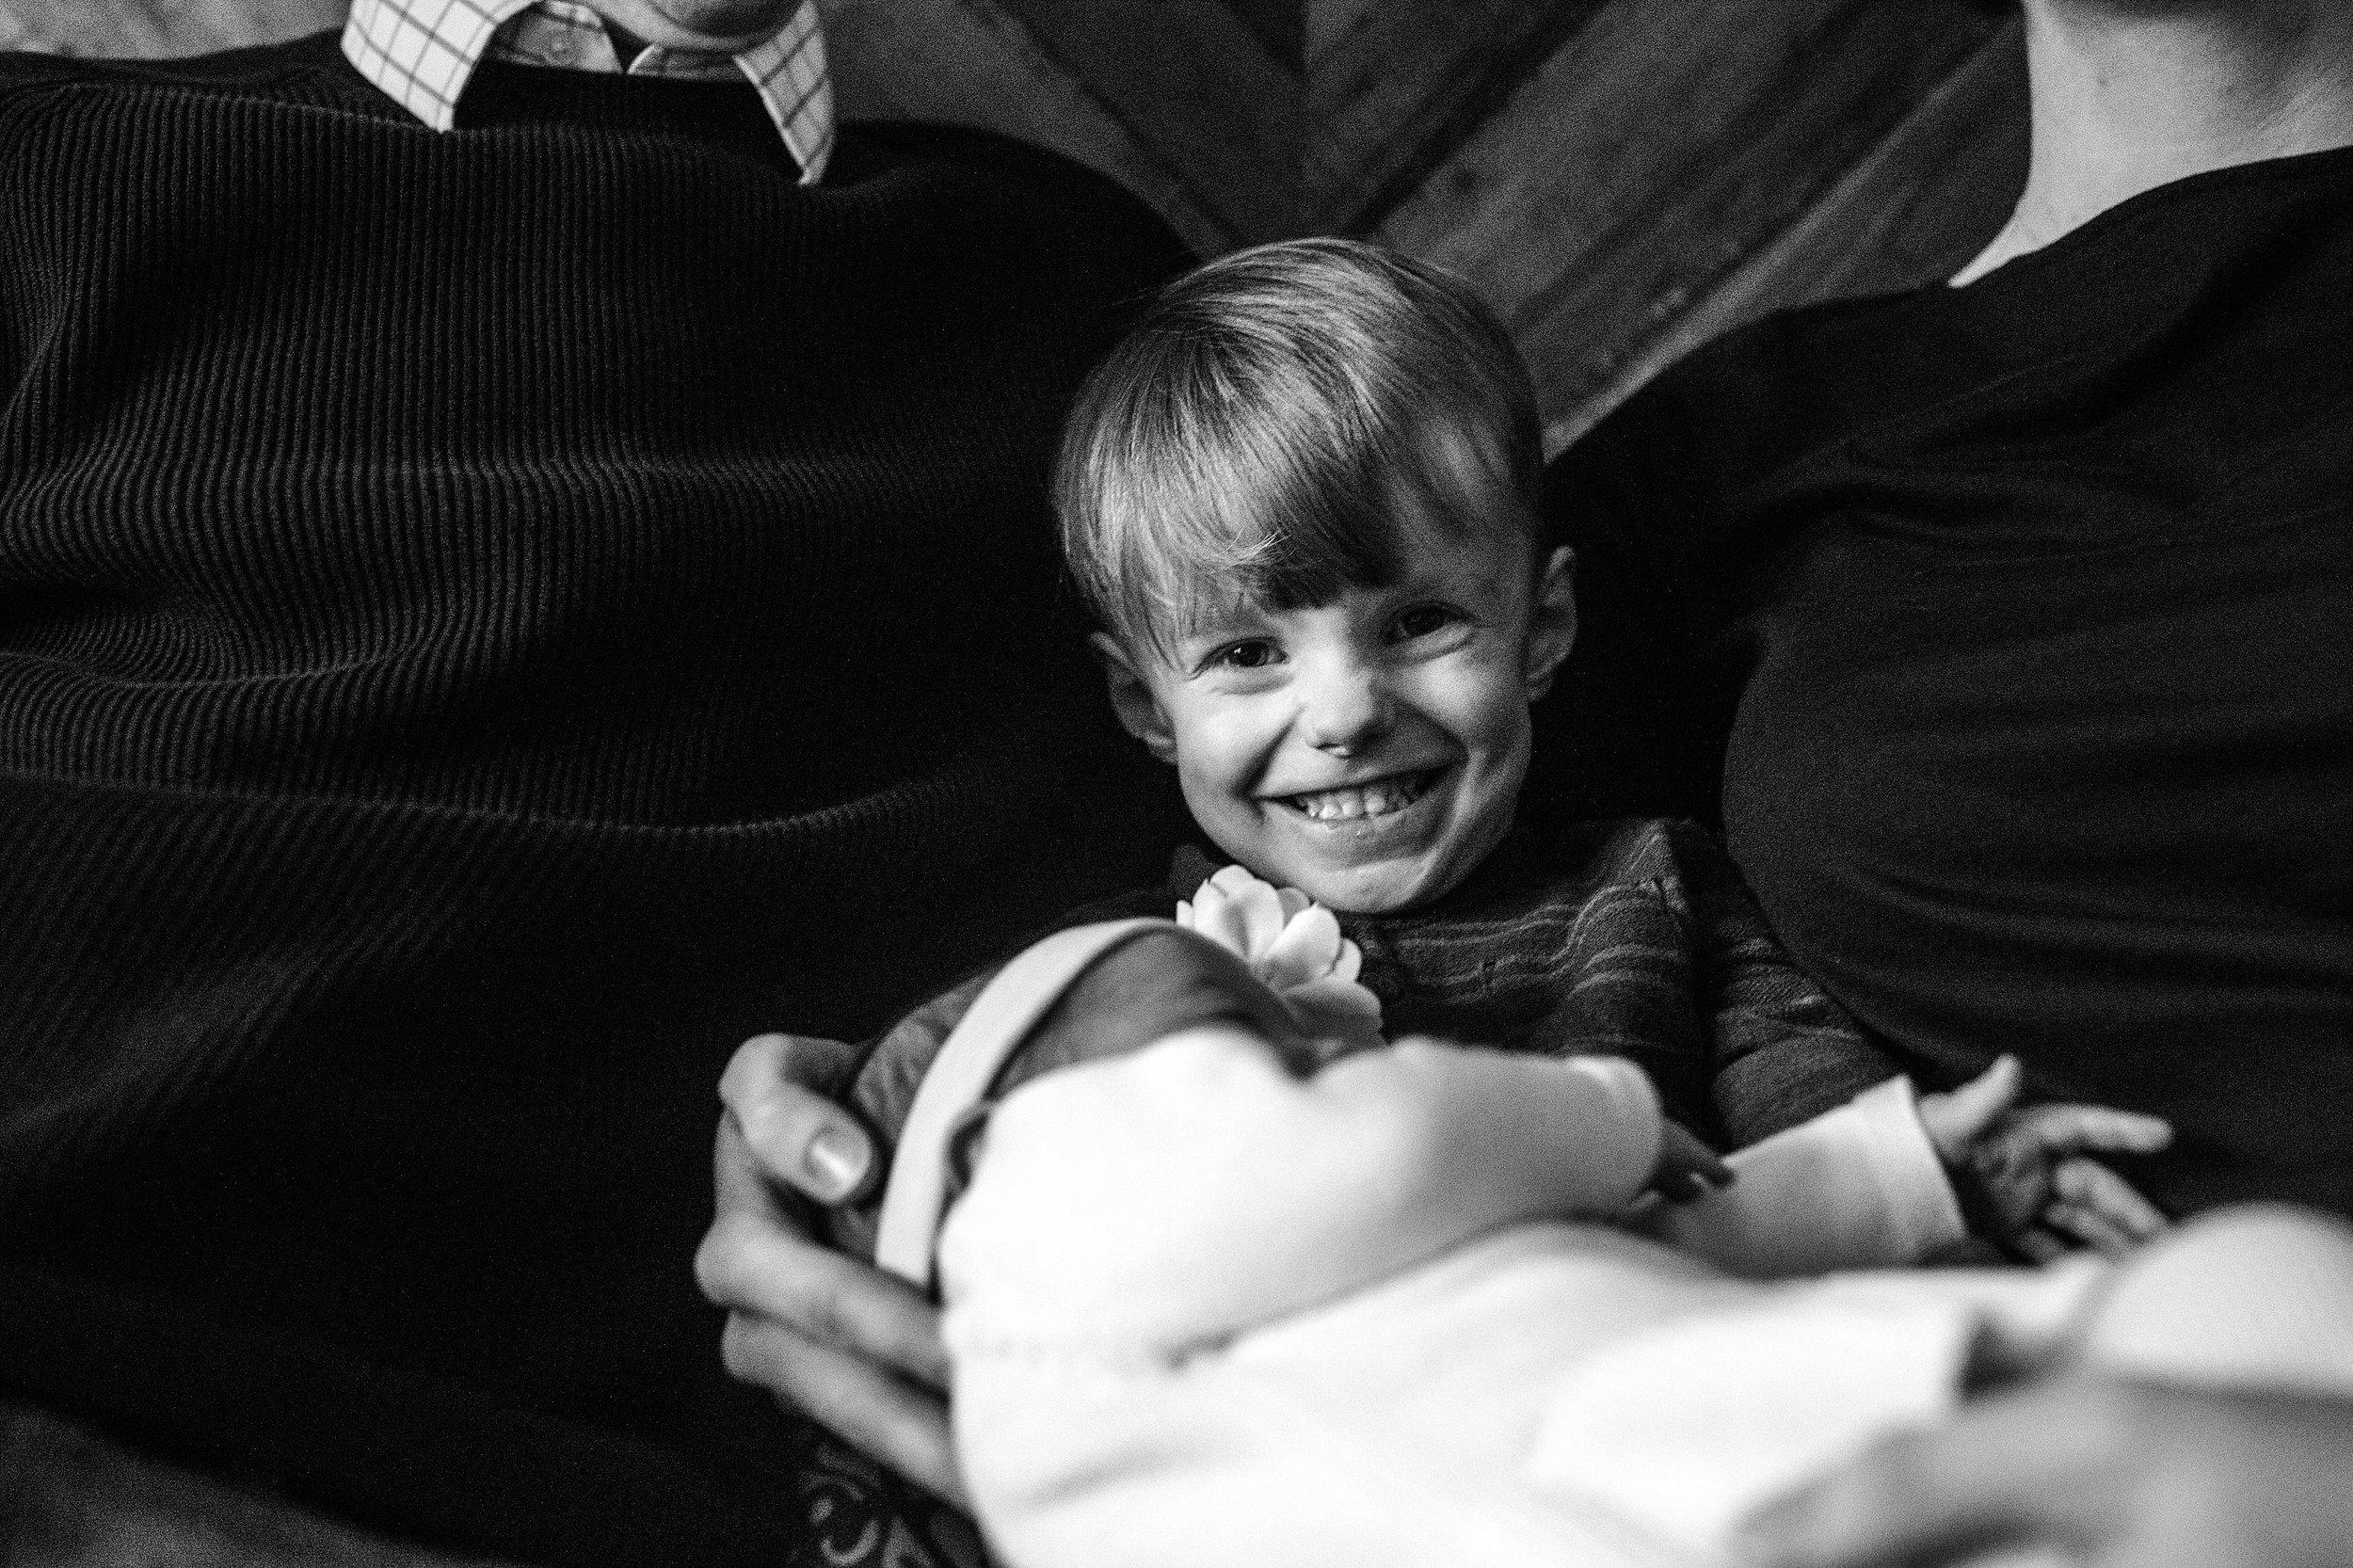 Lehigh-Valley-Newborn-Documentary-Photographer_0010.jpg